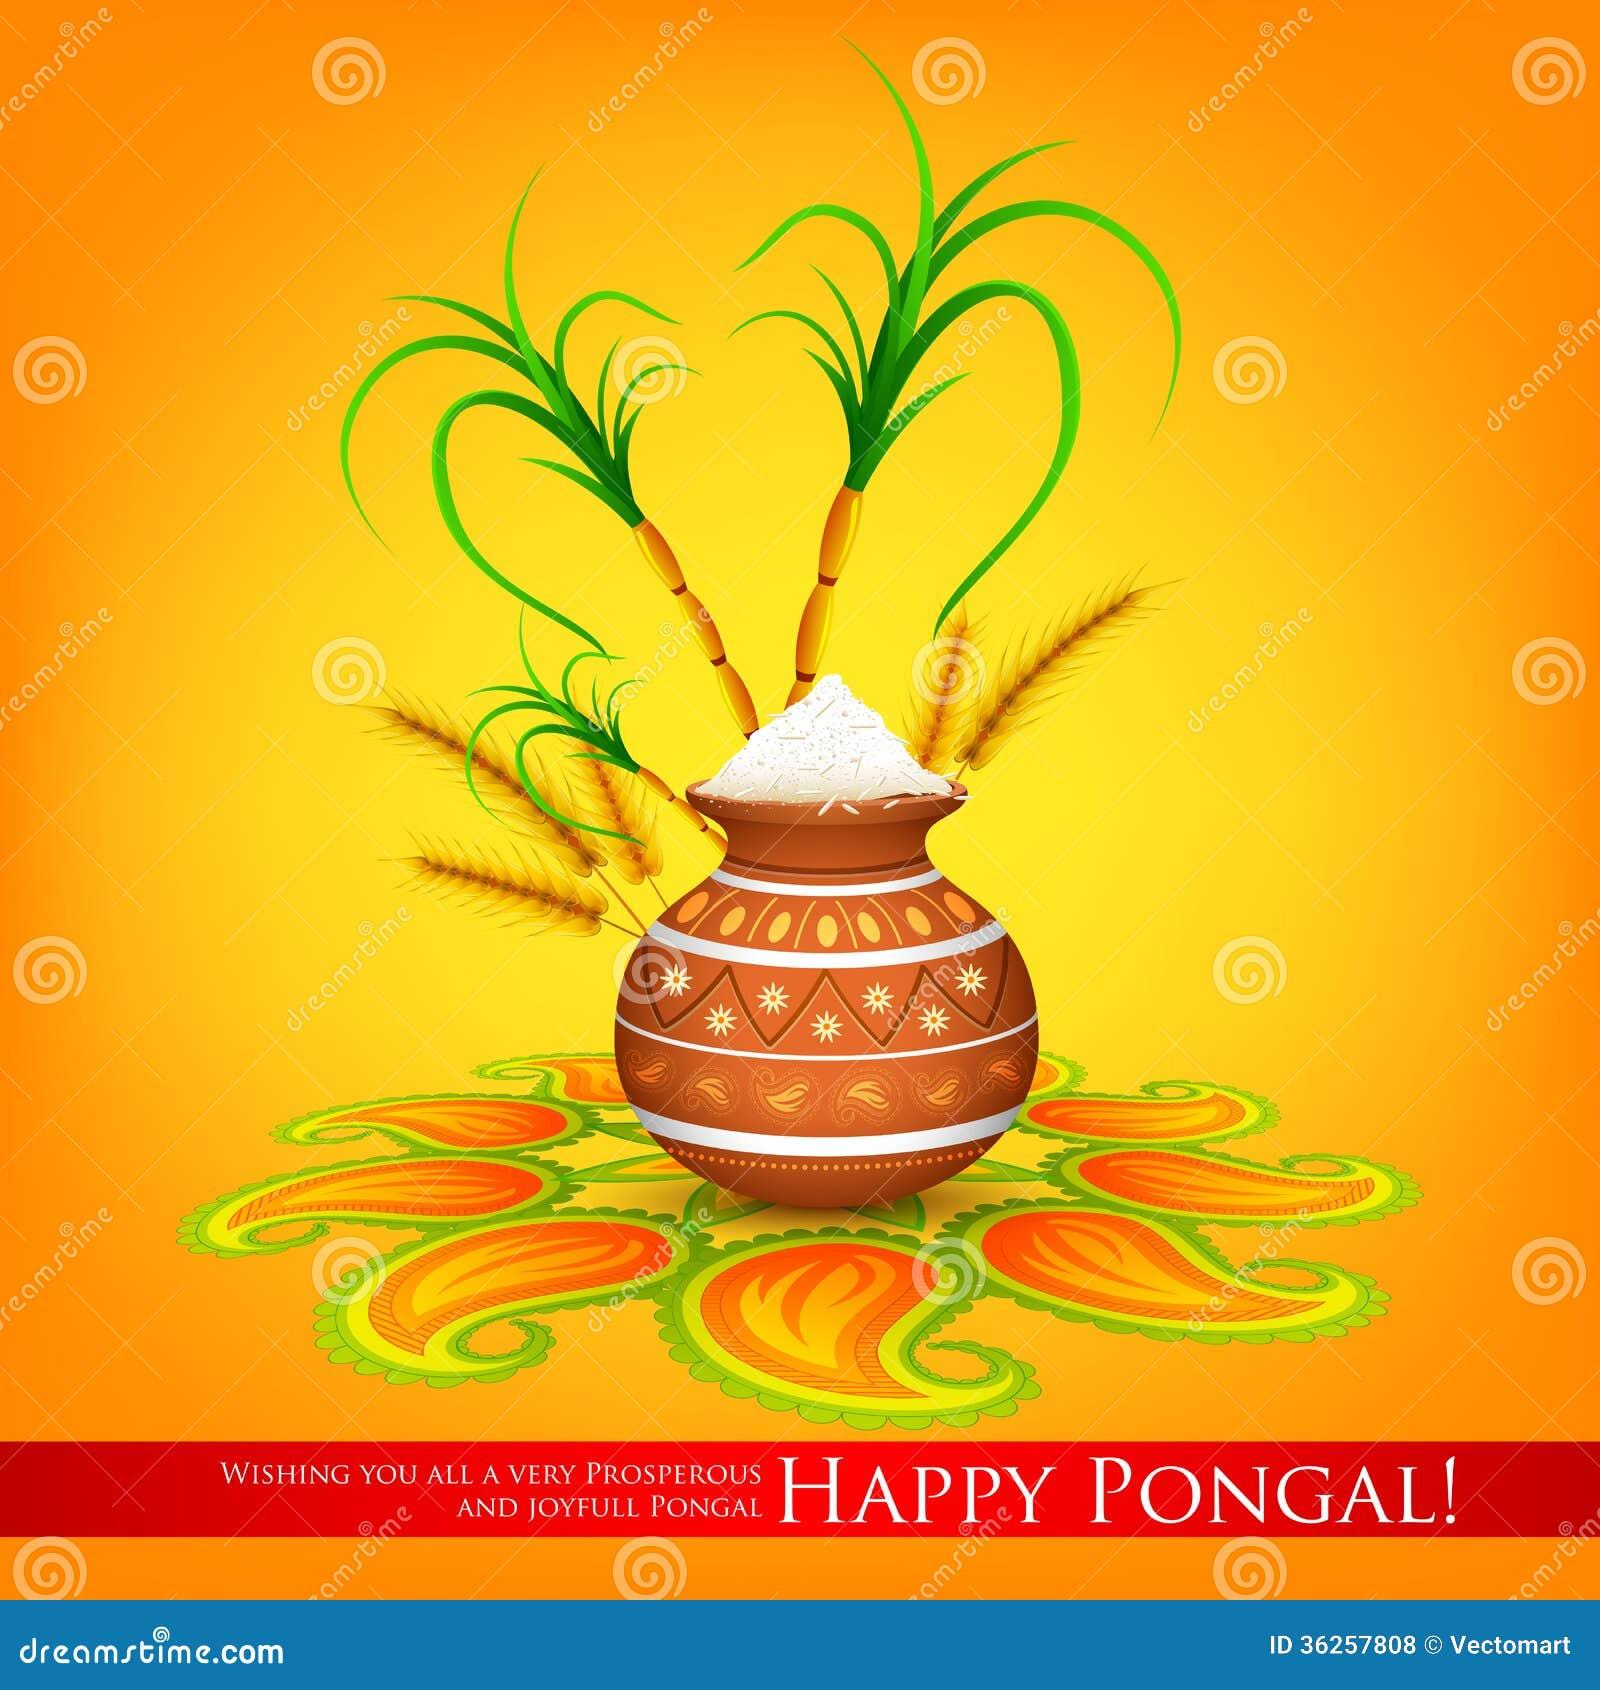 1300 x 1390 jpeg 147kB, Pongal Imgae | New Calendar Template Site